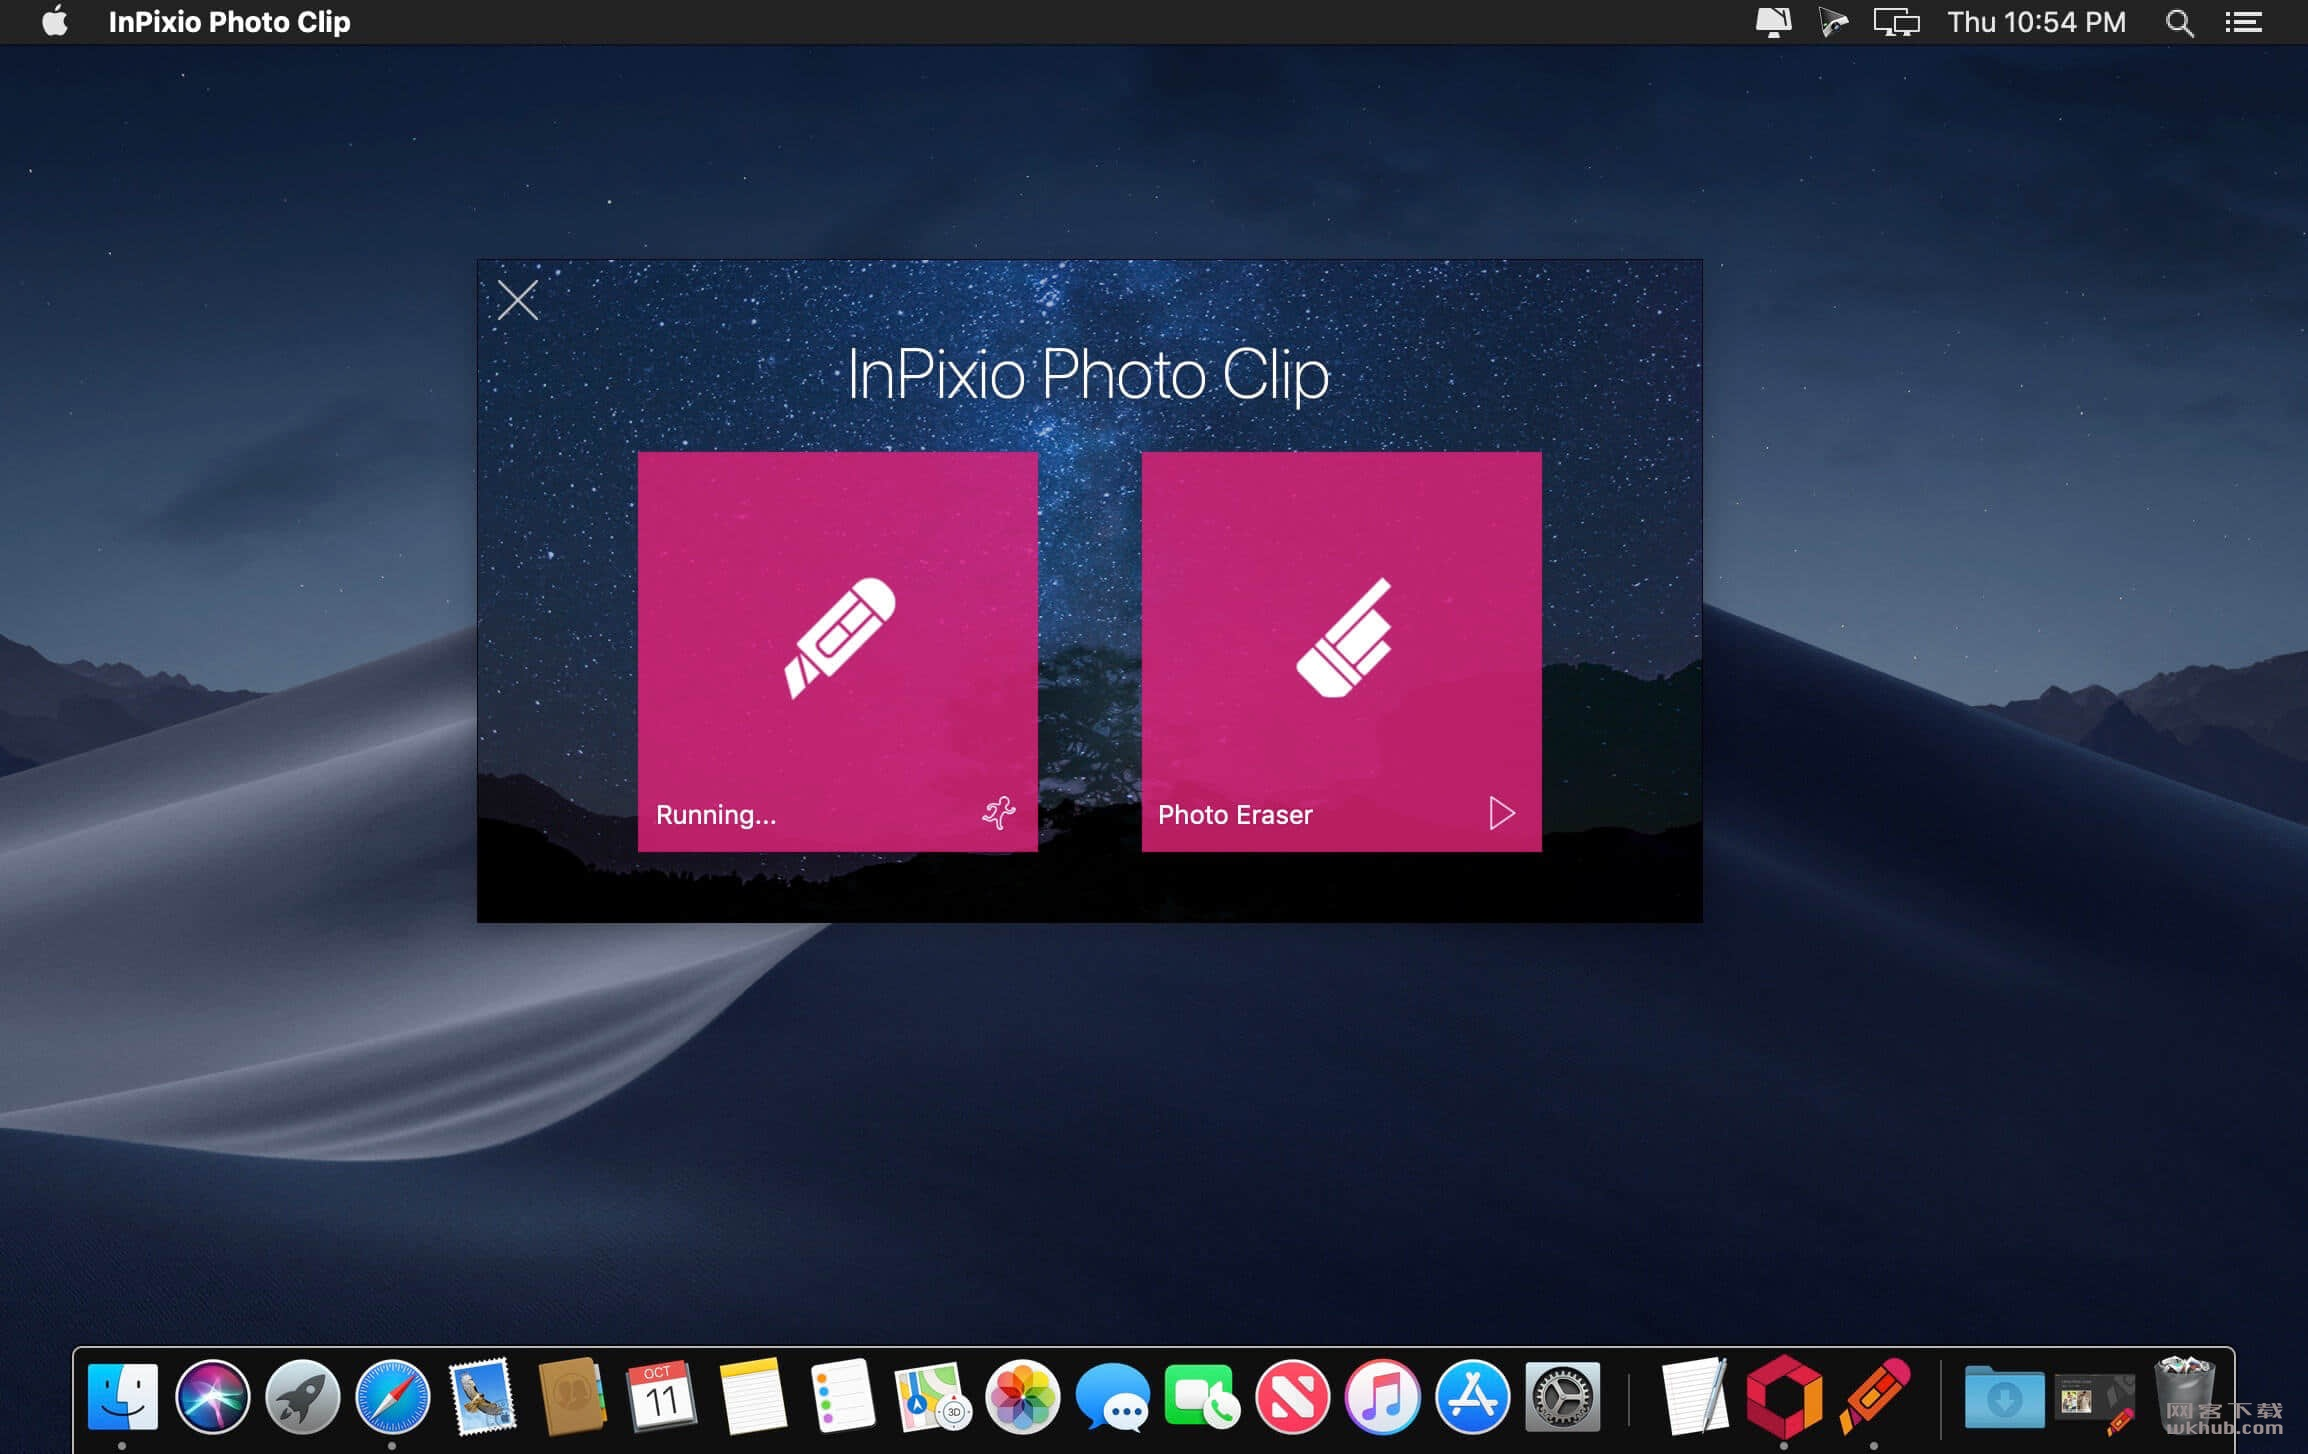 InPixio Photo Clip 1.1.9 照片剪辑工具